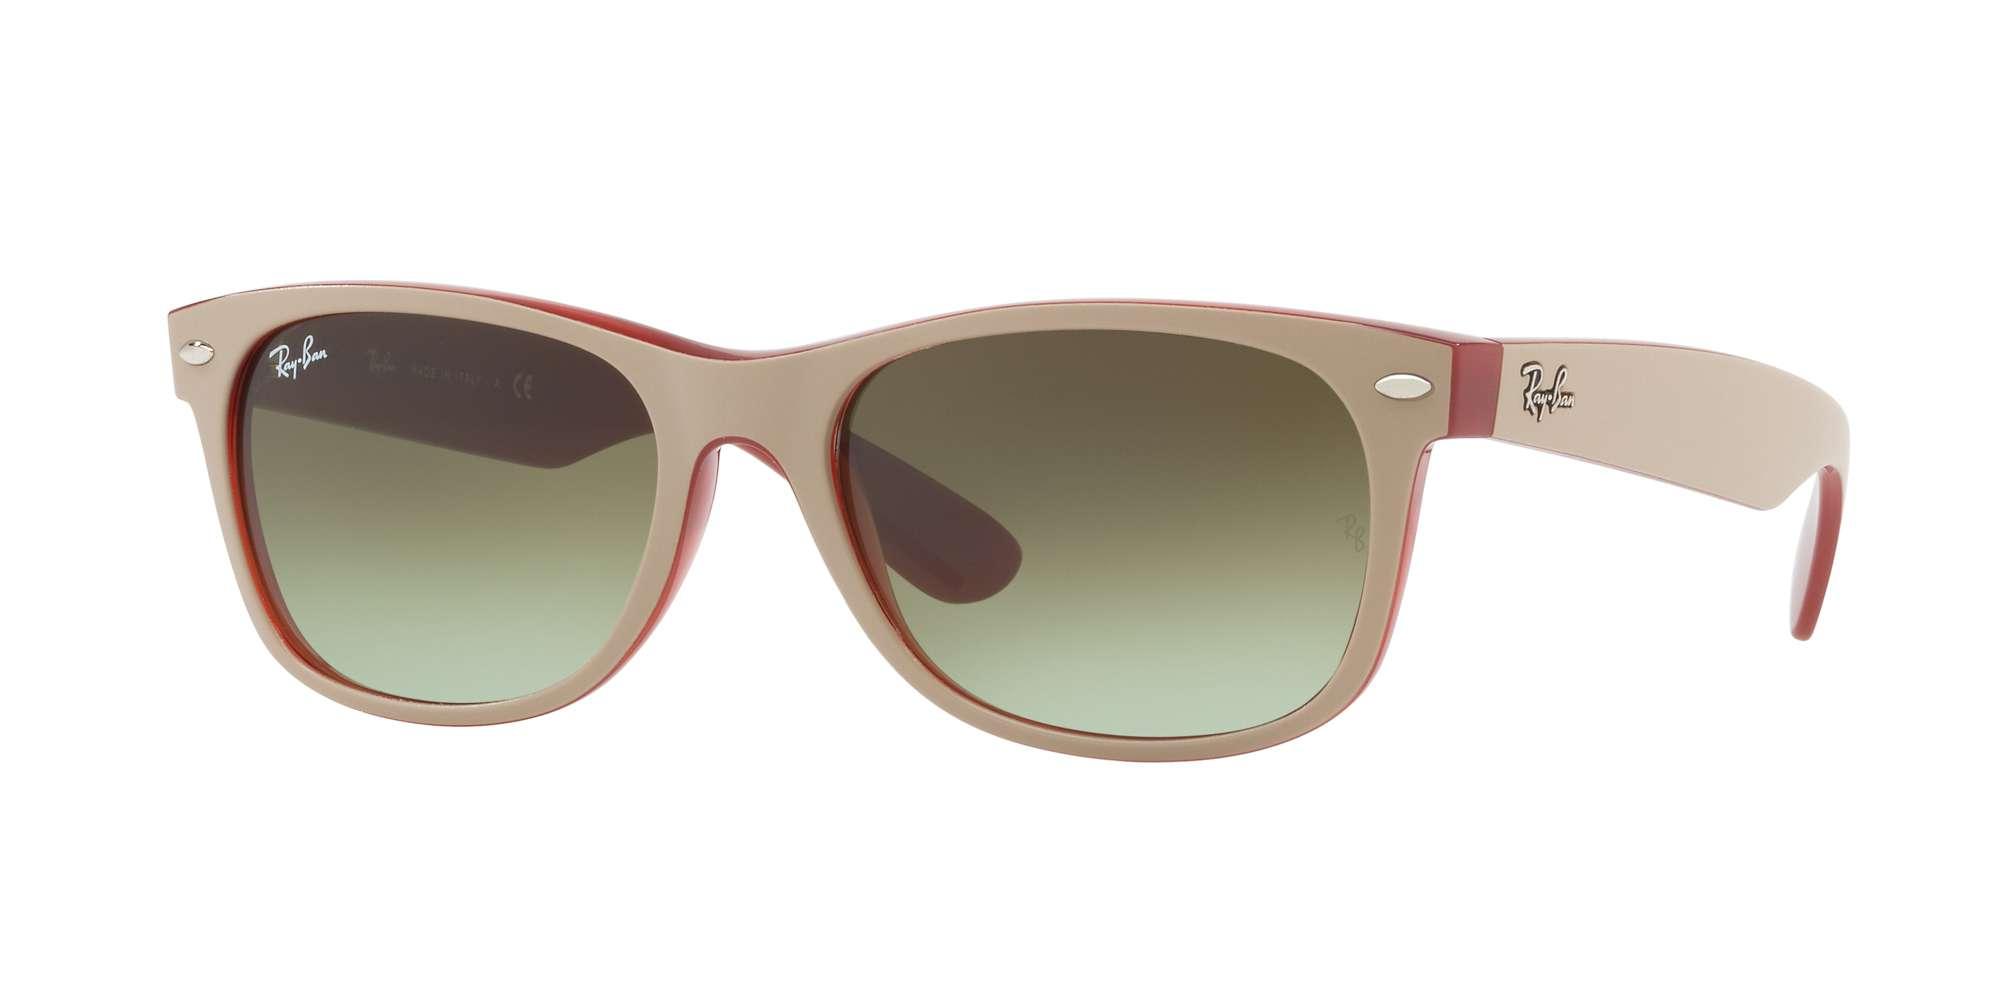 MATTE BEIGE ON OPAL RED / GREEN GRADIENT BROWN lenses